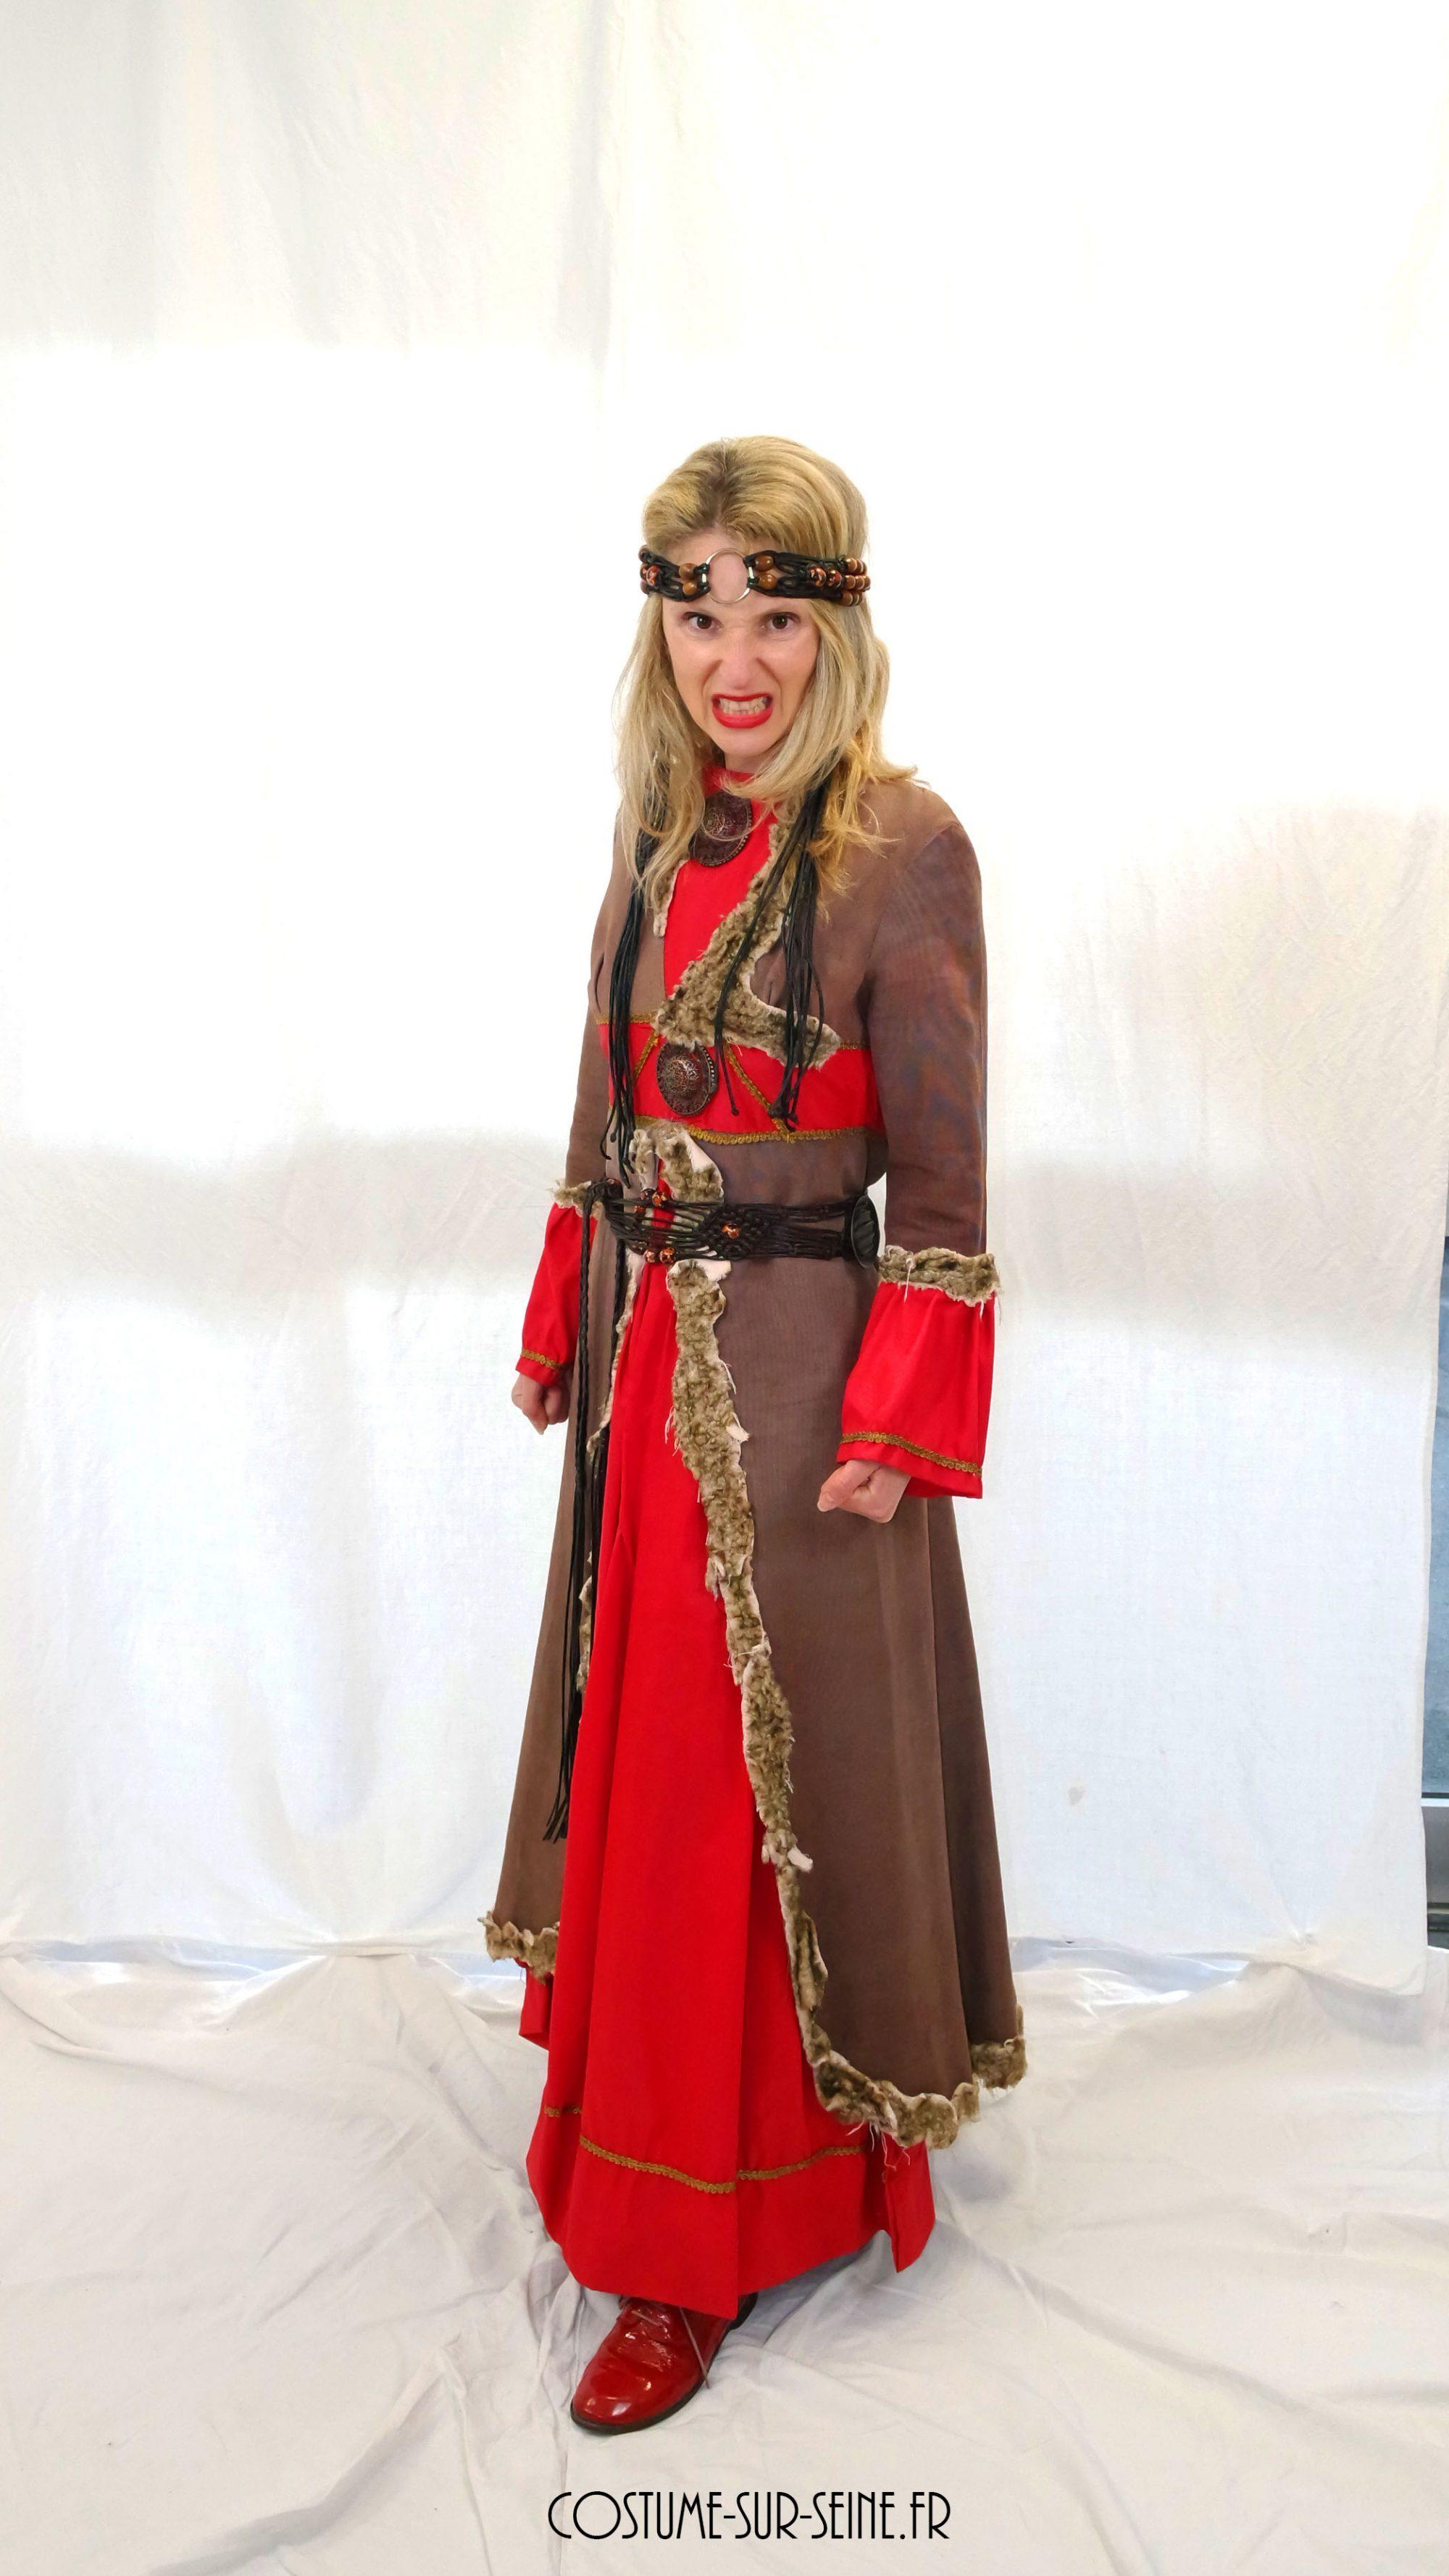 costume sur seine femme celte